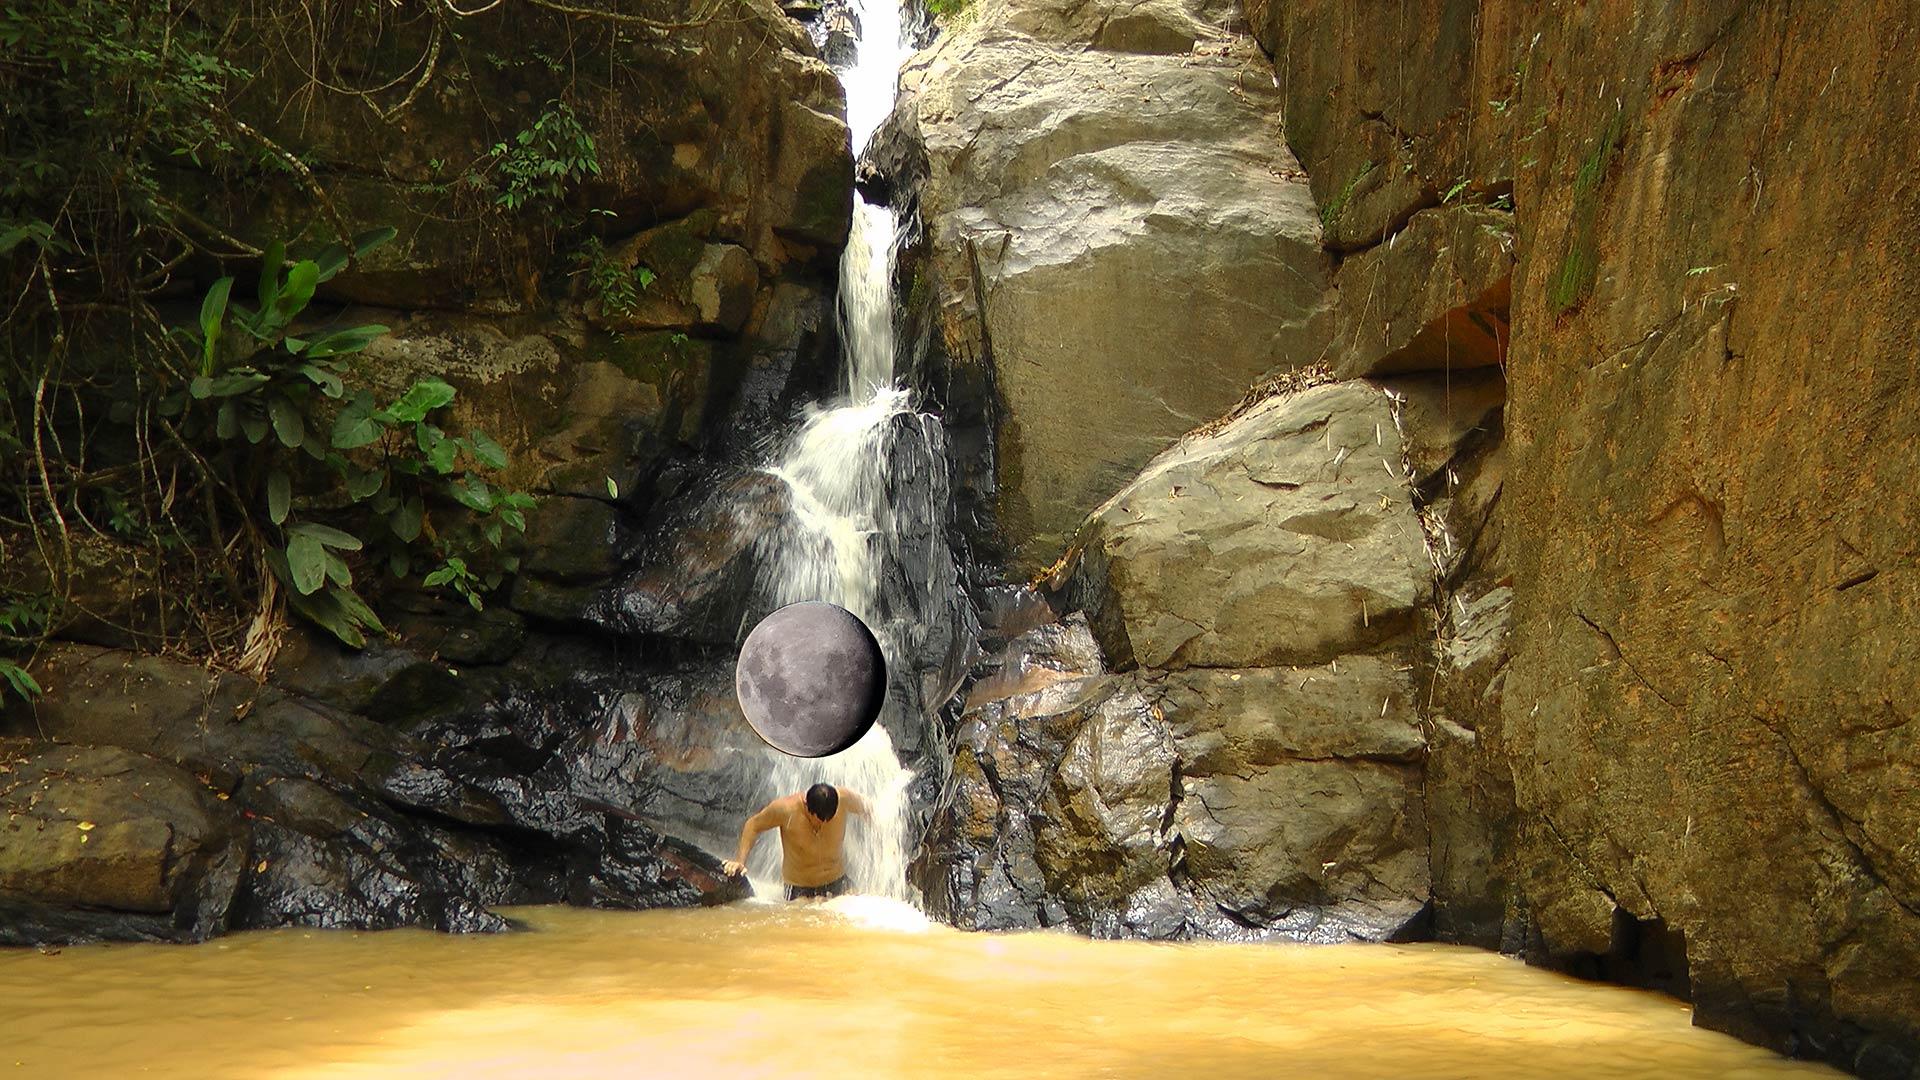 Waterfall - Minas Gerais - Brazil